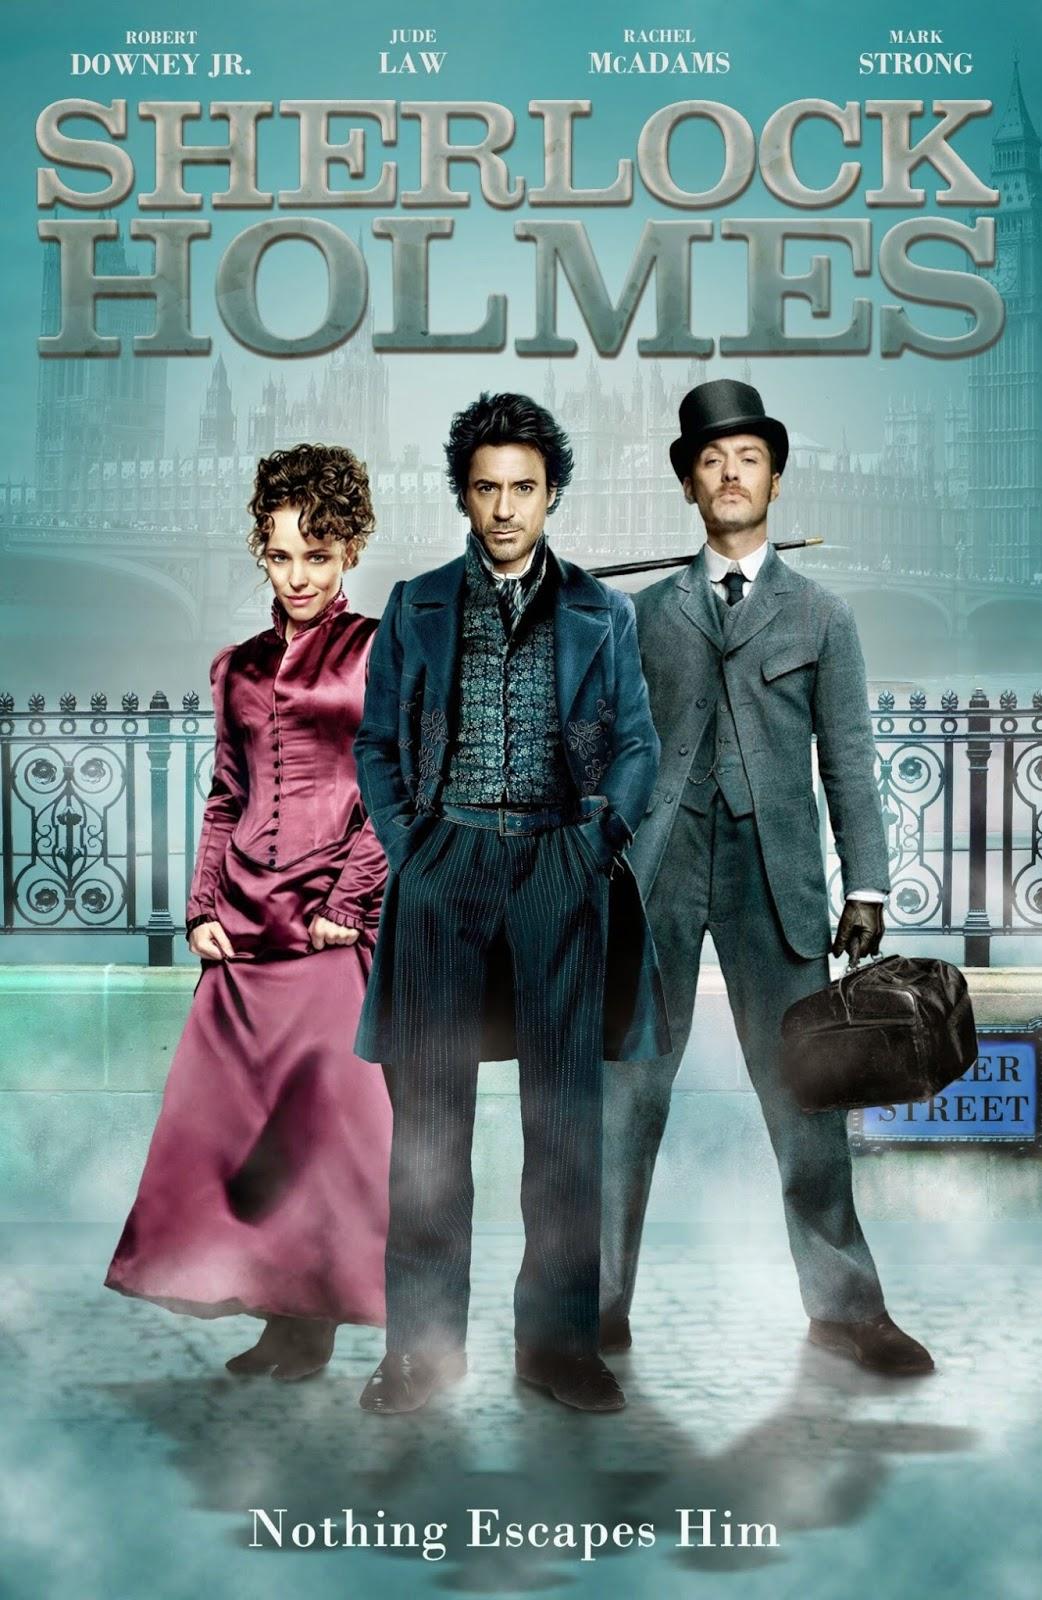 Sherlock Holmes เชอร์ล็อค โฮล์มส์ ดับแผนพิฆาตโลก [HD][พากย์ไทย]